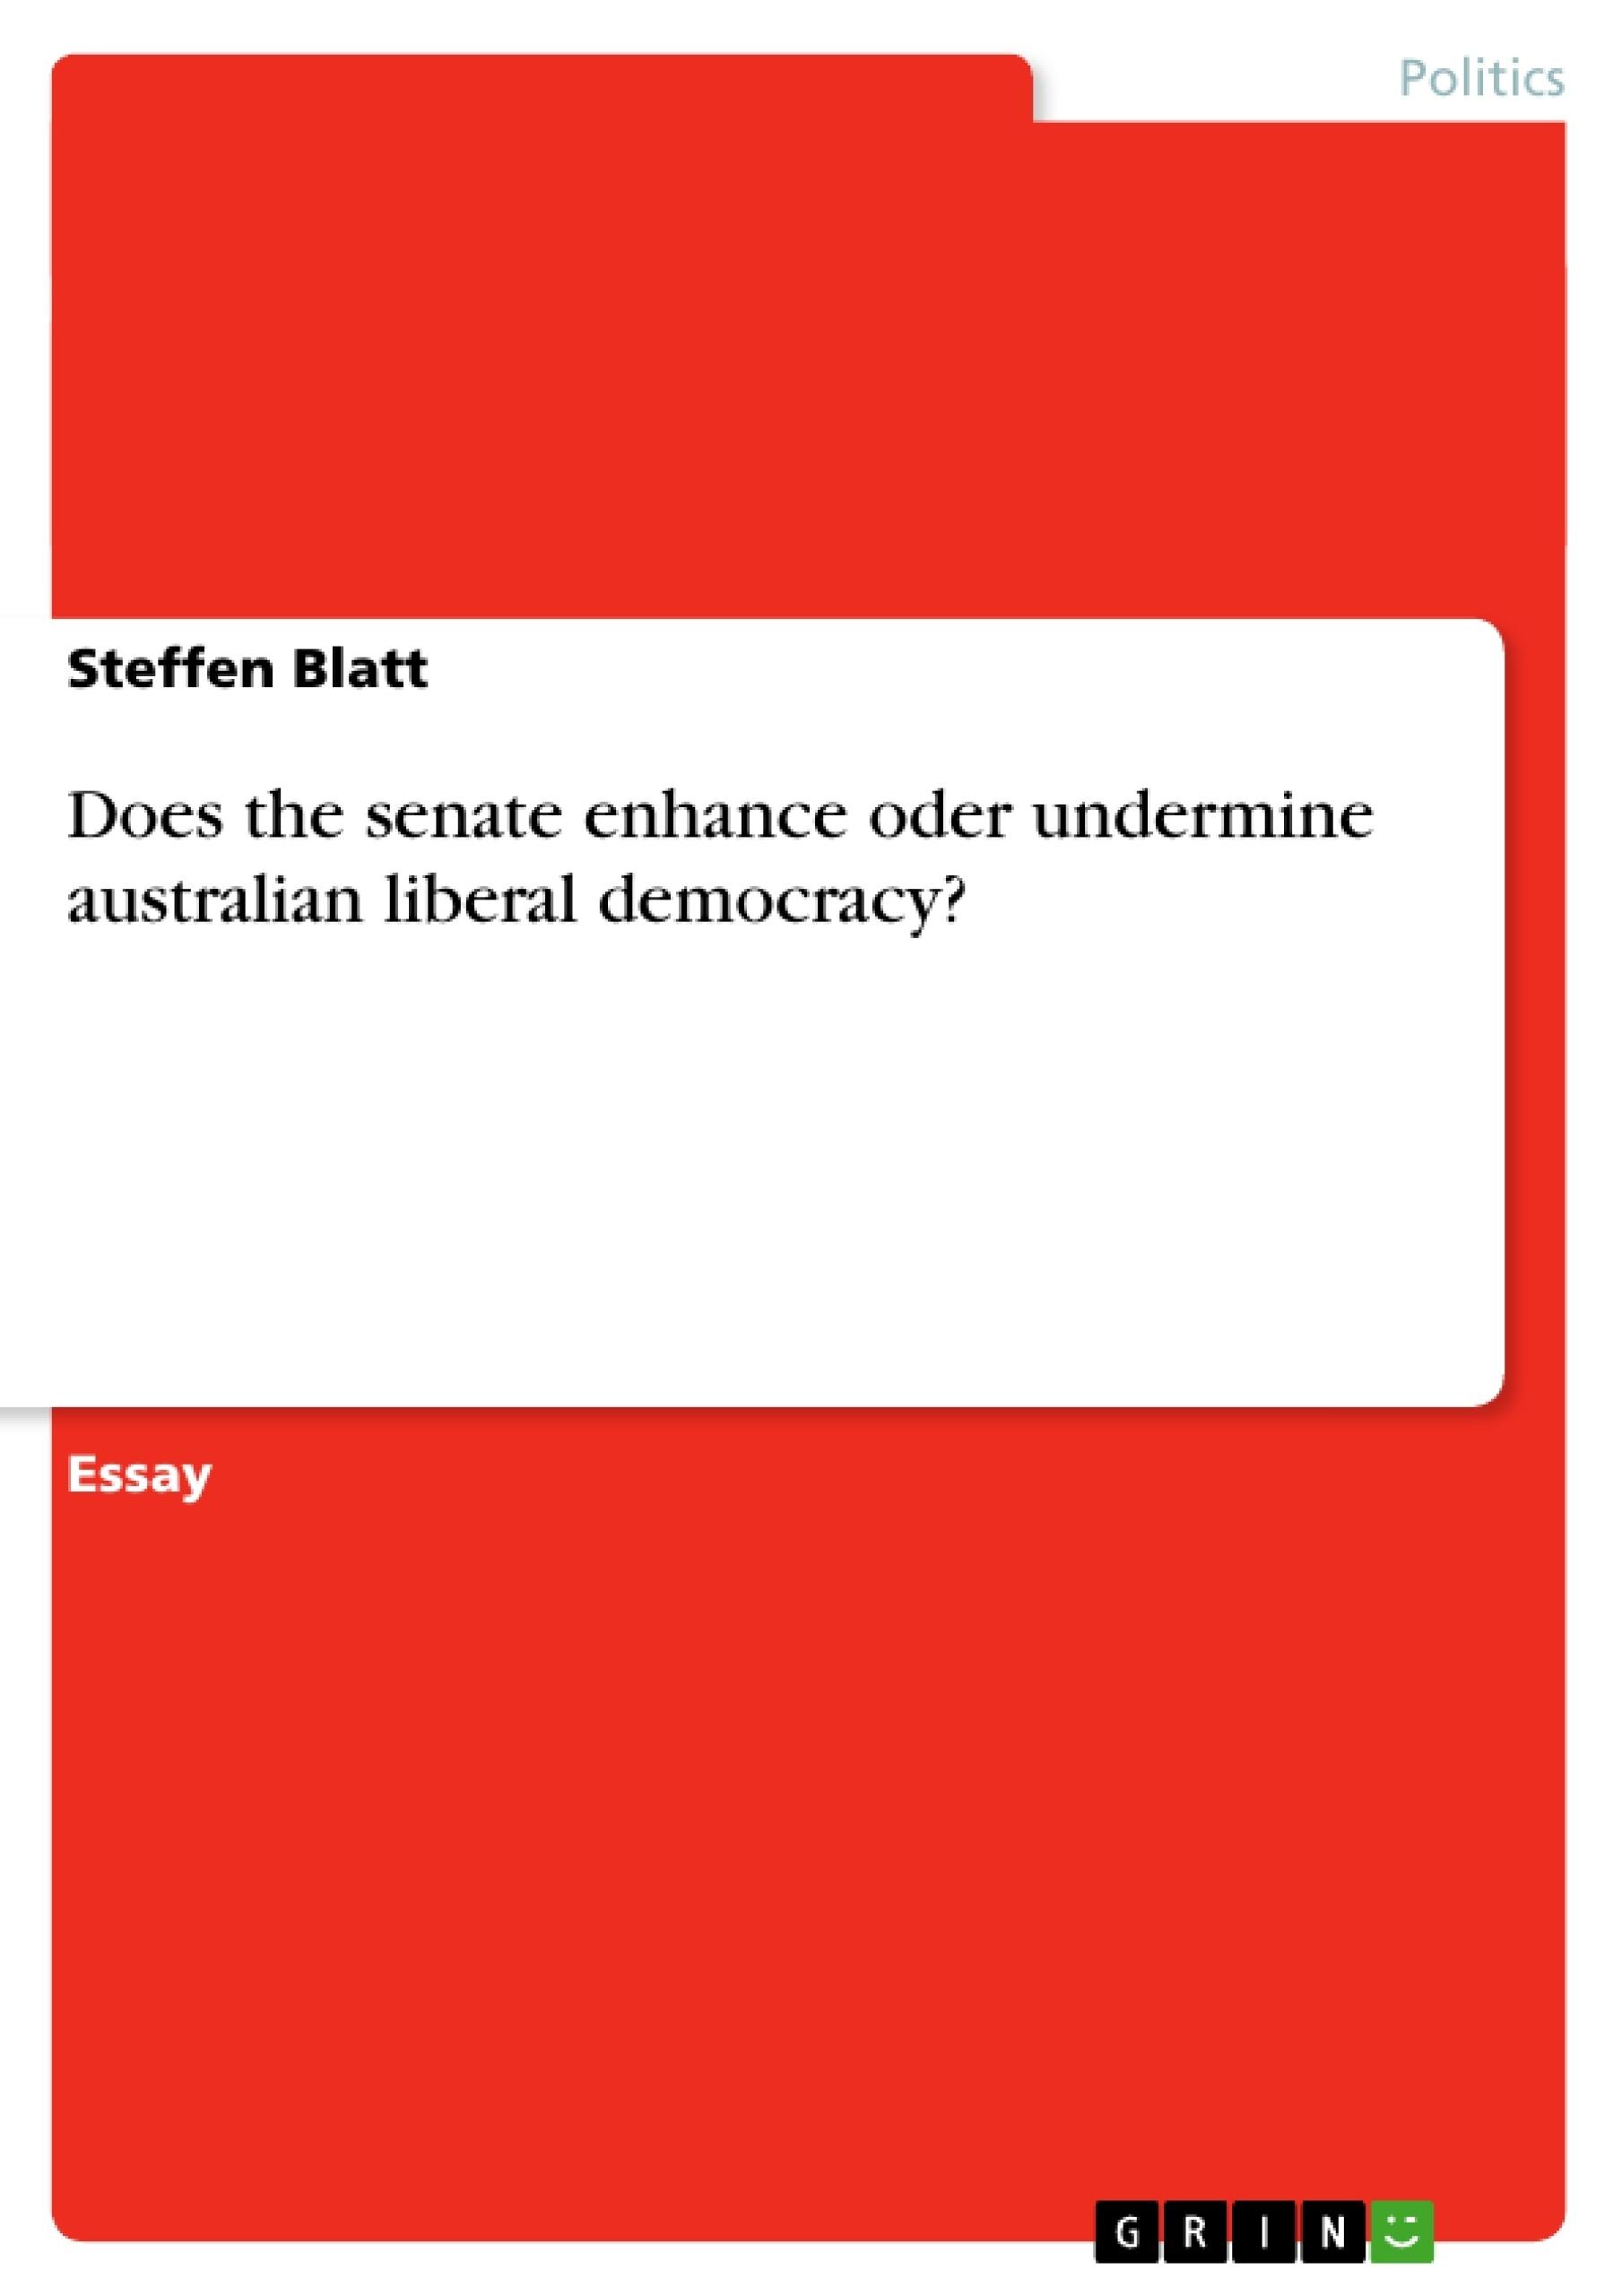 Title: Does the senate enhance oder undermine australian liberal democracy?